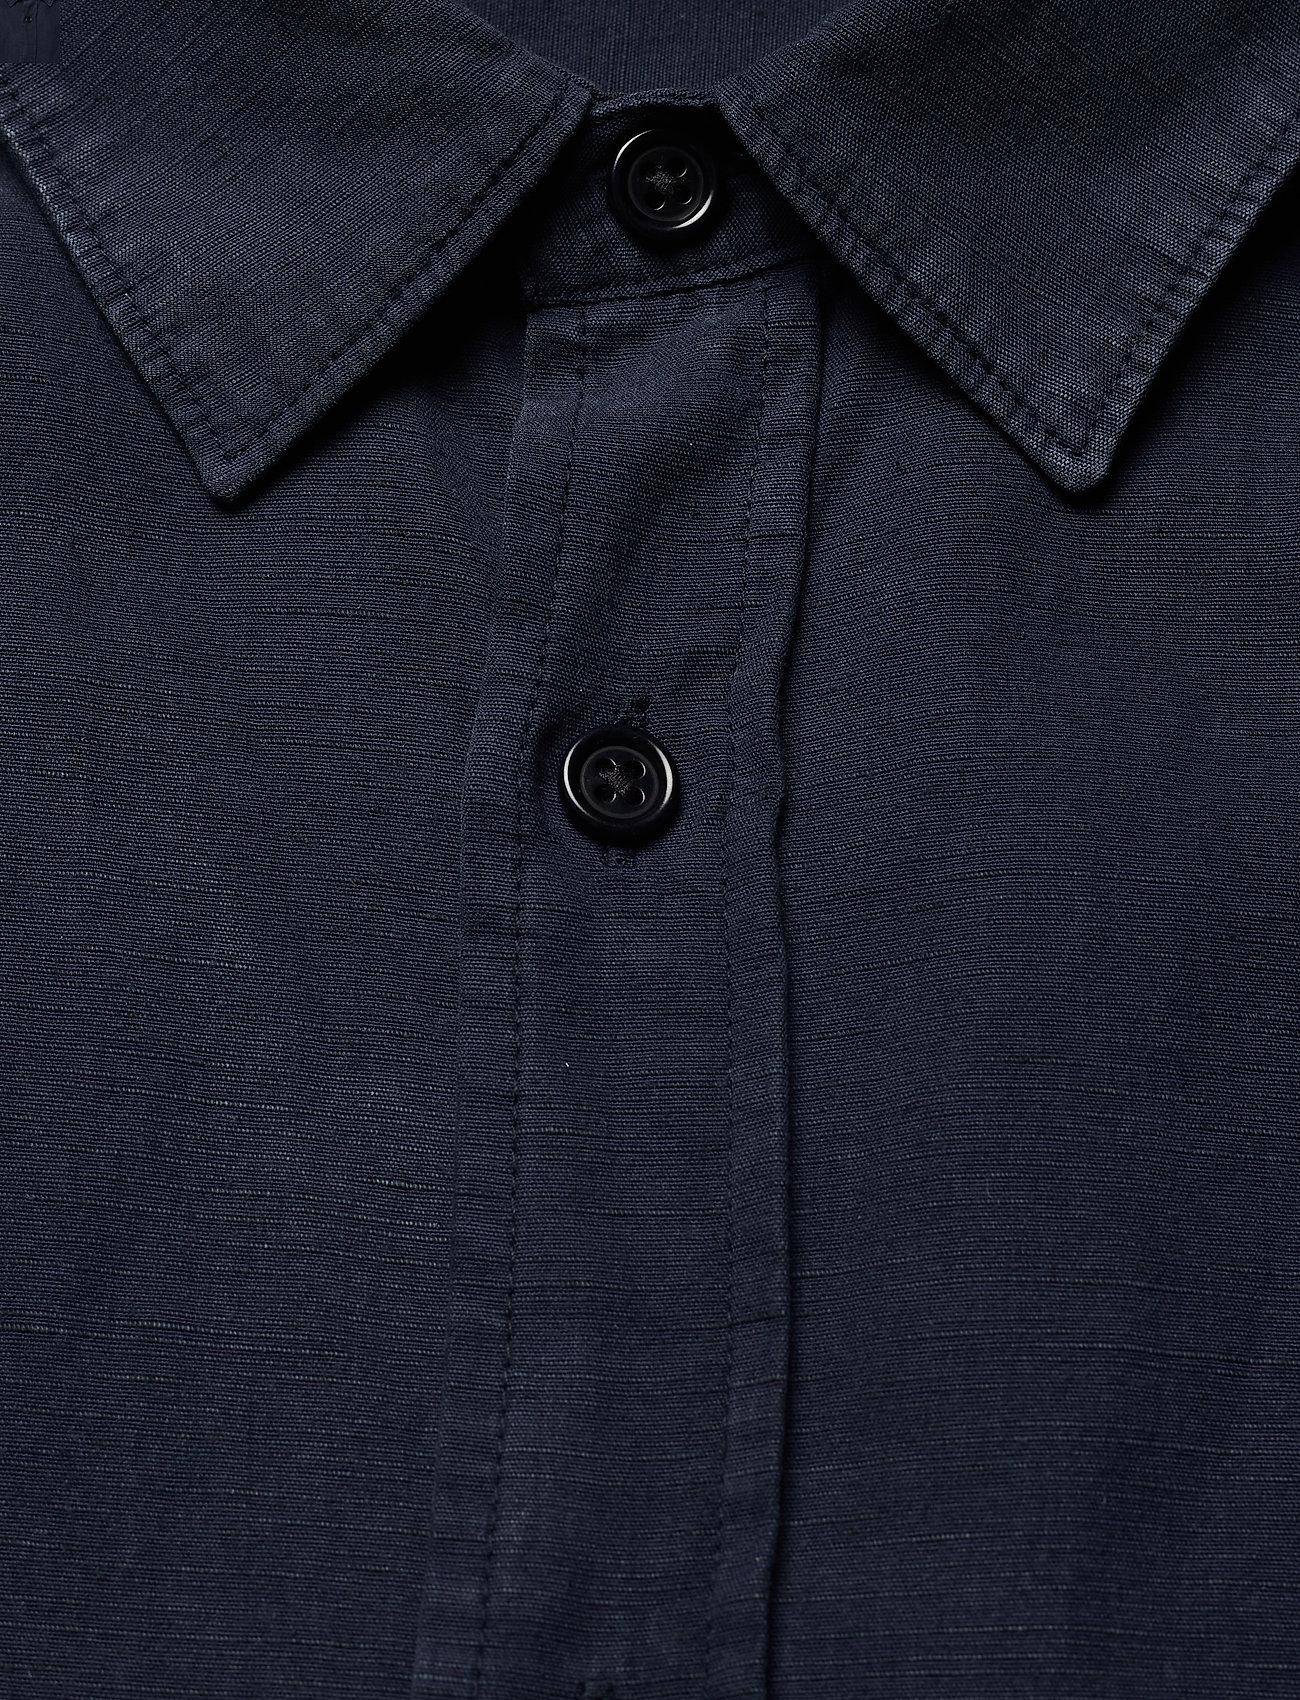 J. Lindeberg Tencel Slub Texture Slim Shirt - Skjorter JL NAVY - Menn Klær